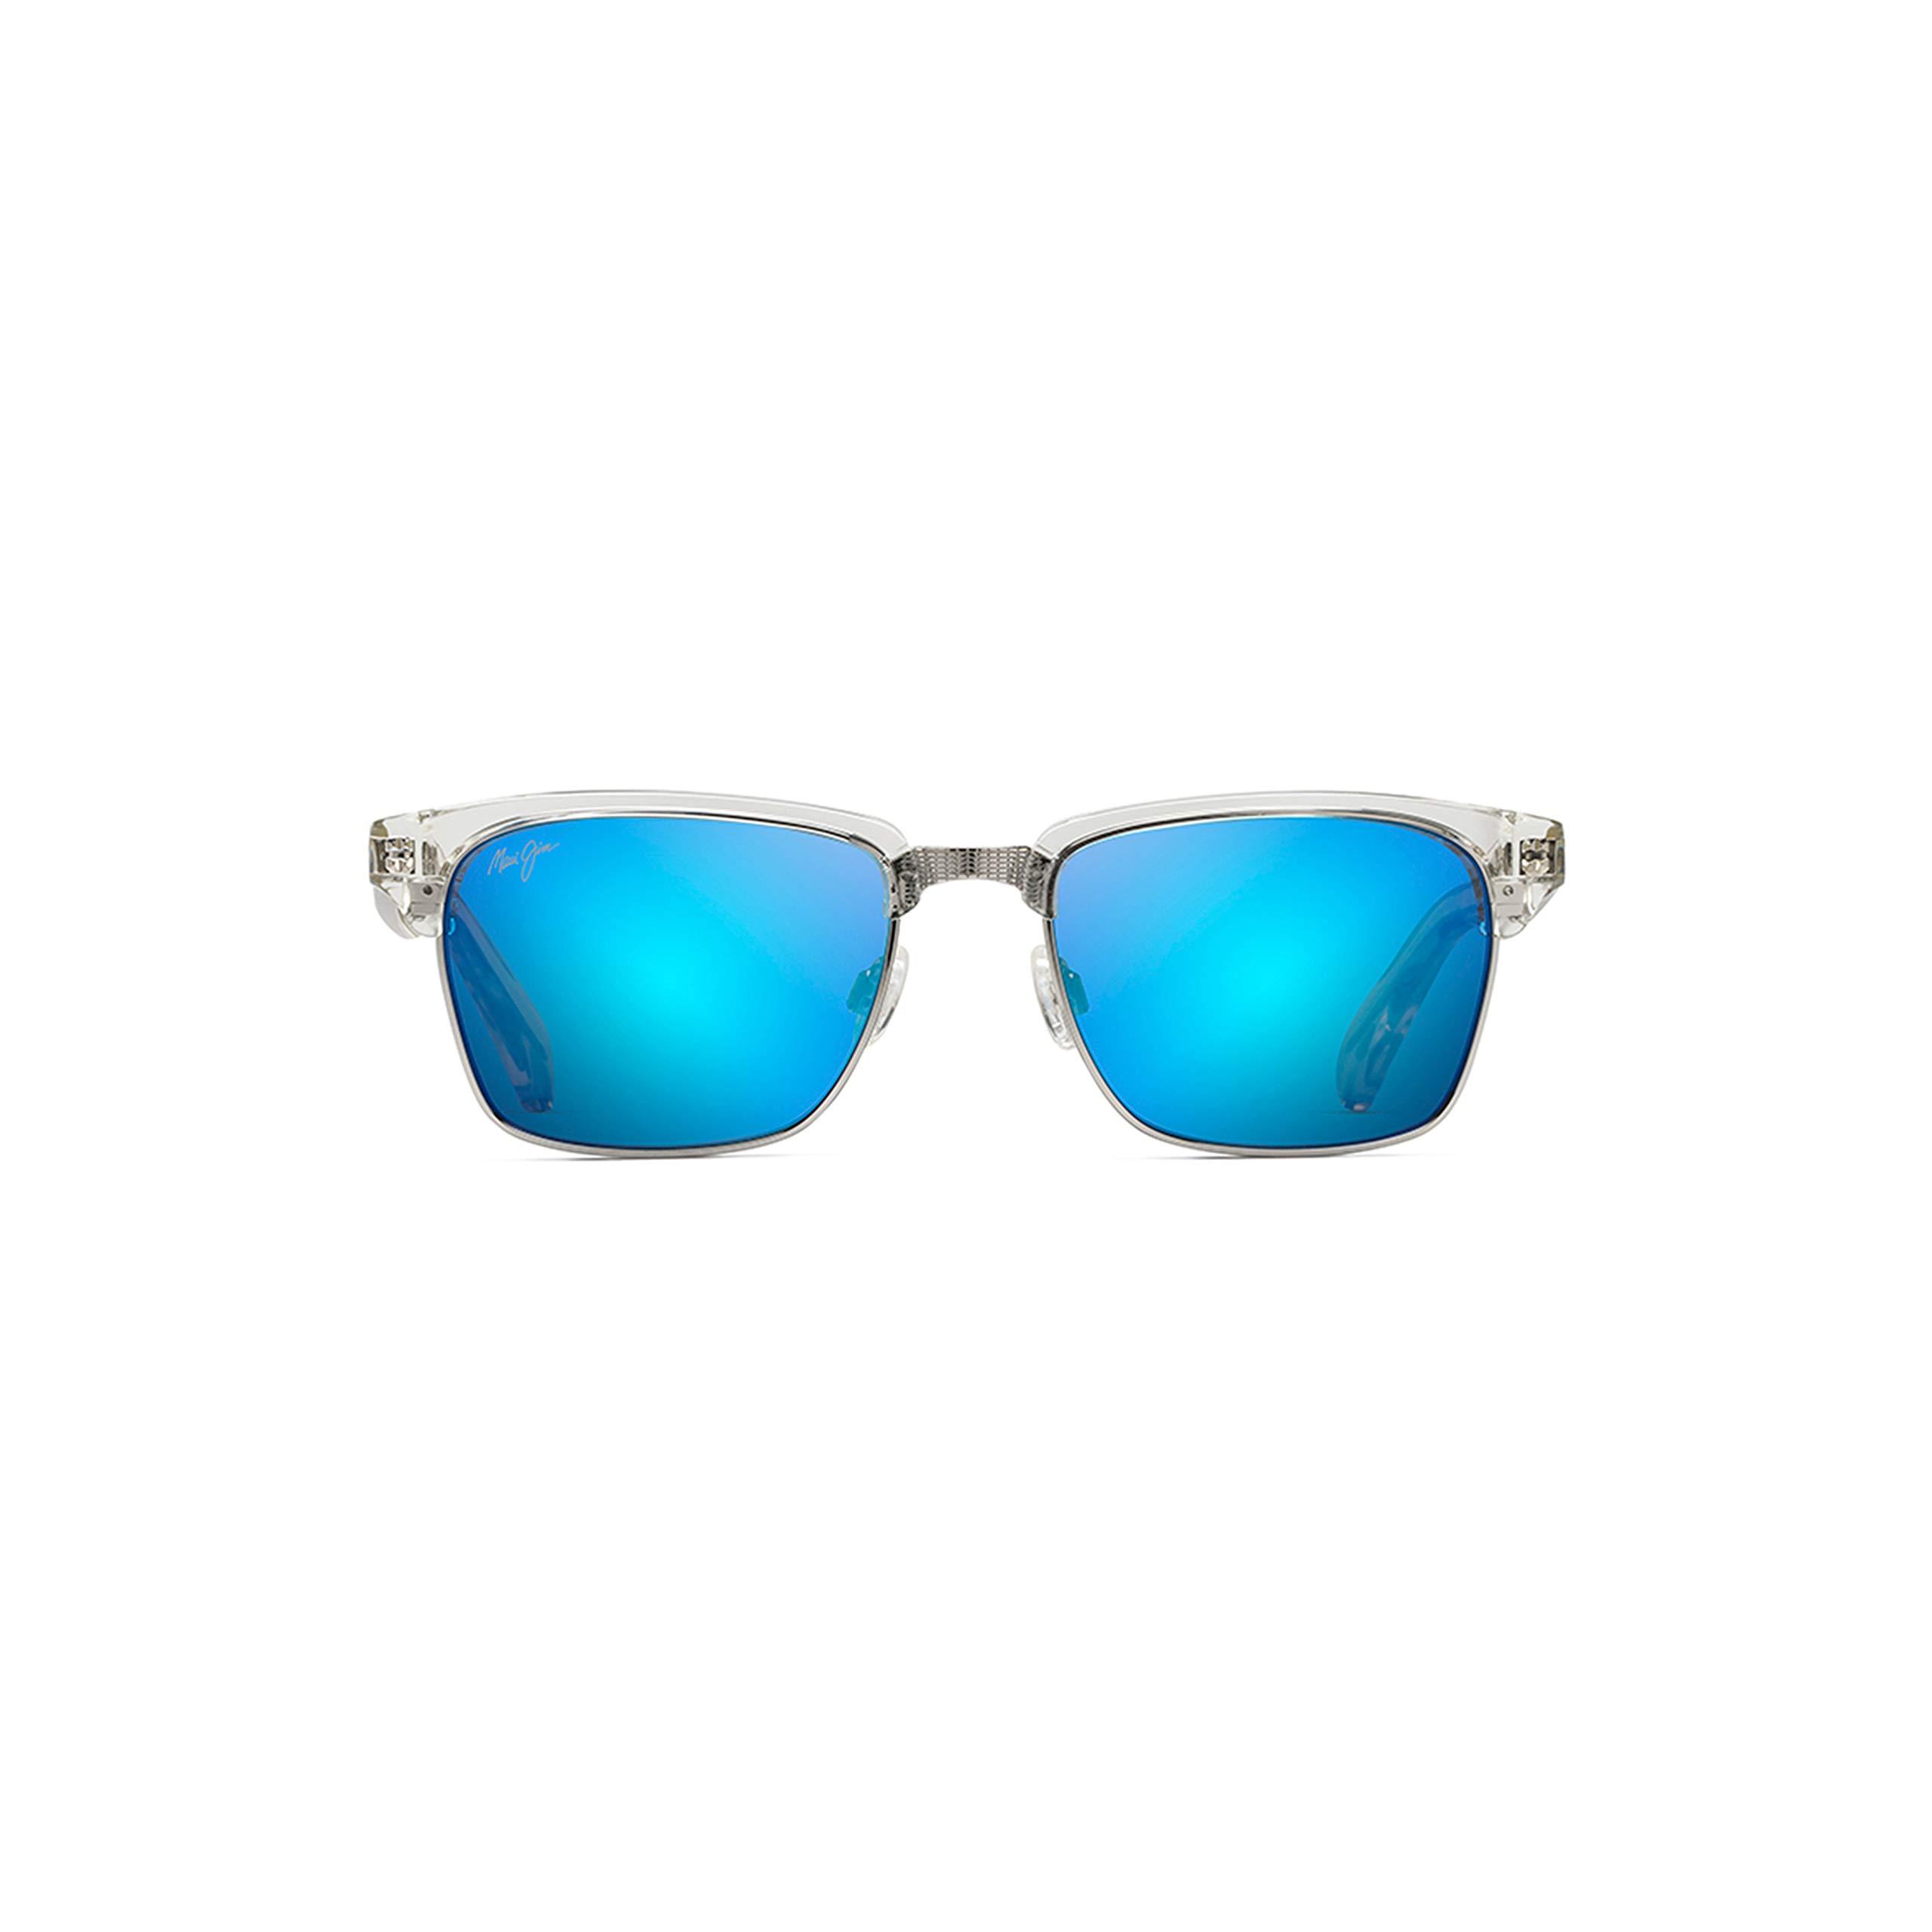 ویکالا · خرید  اصل اورجینال · خرید از آمازون · Maui Jim Sunglasses | Kawika 257 | Classic Frame, Polarized Lenses, with Patented PolarizedPlus2 Lens Technology wekala · ویکالا